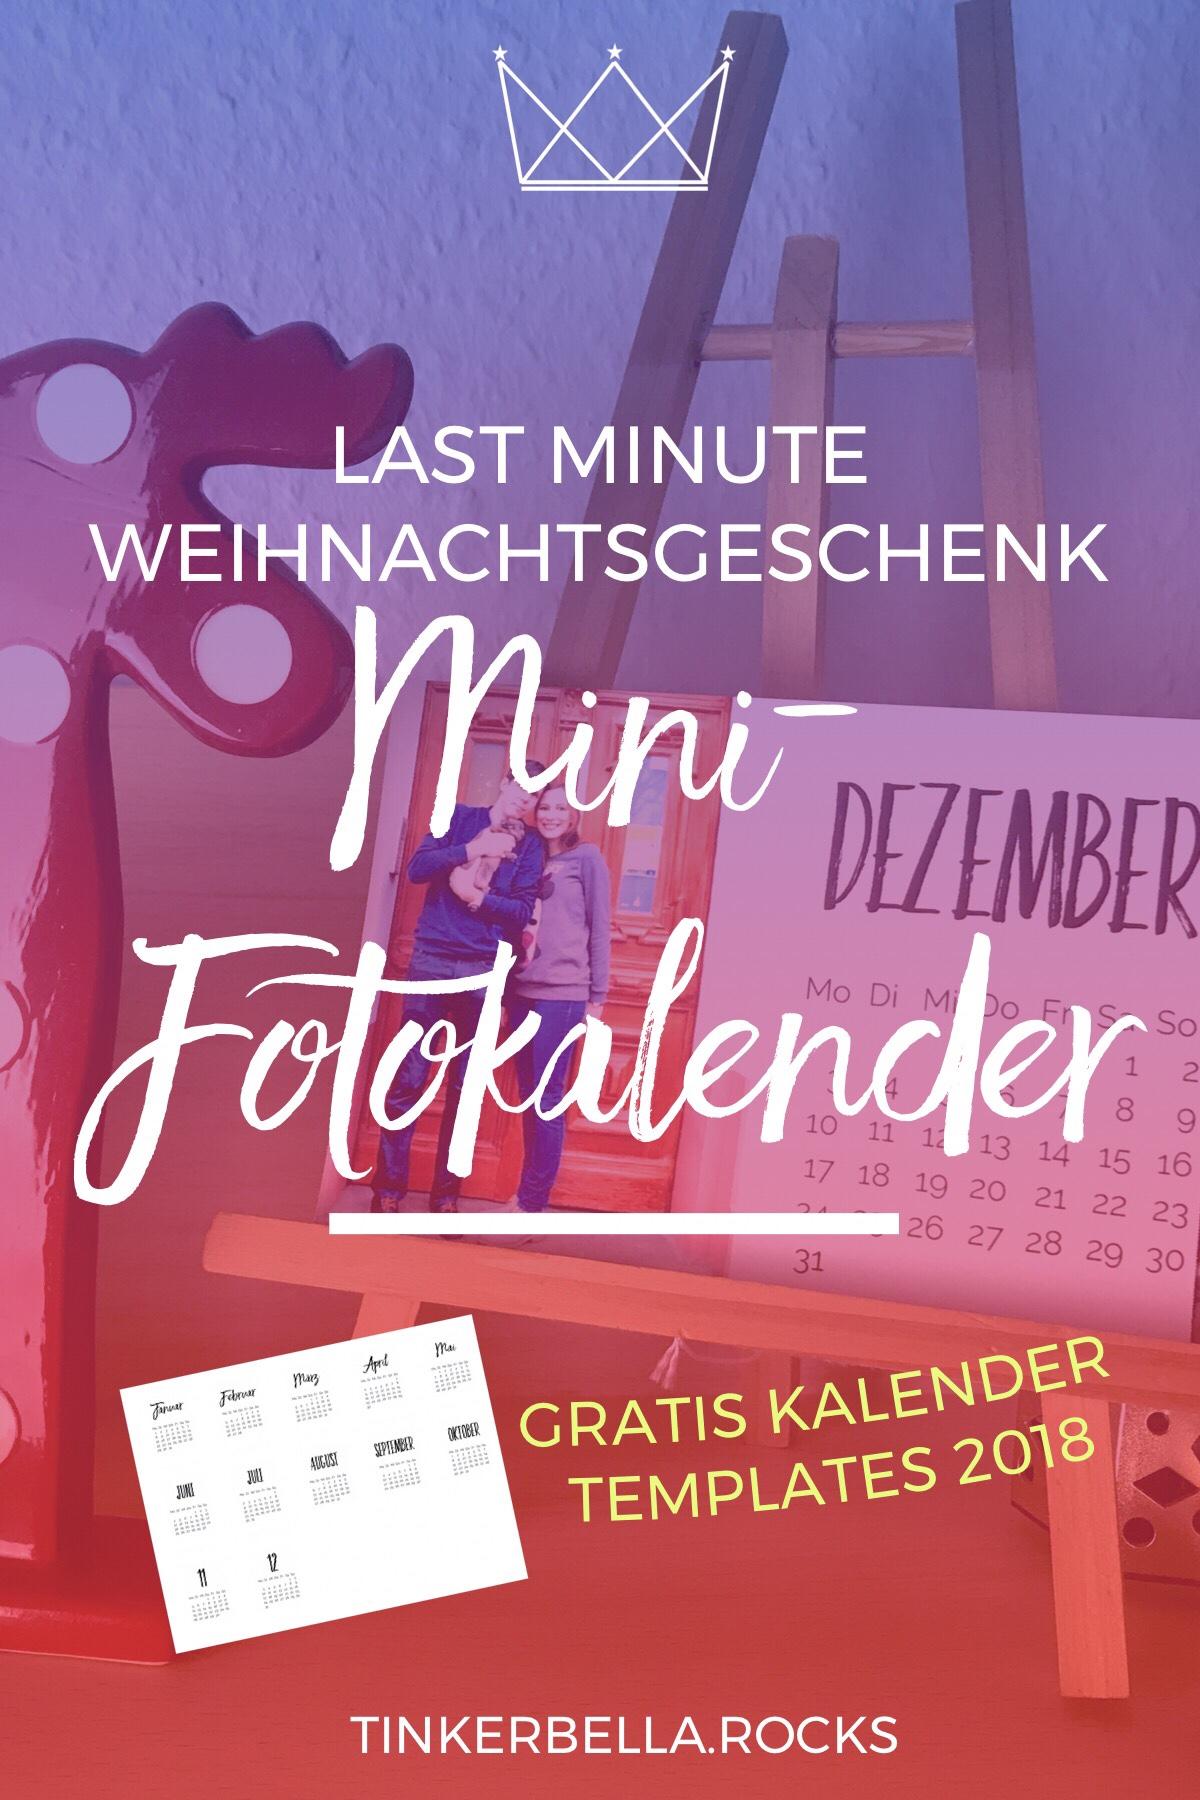 Last Minute Weihnachtsgeschenk: Mini-Fotokalender inkl. Gratis Kalender Templates 2018